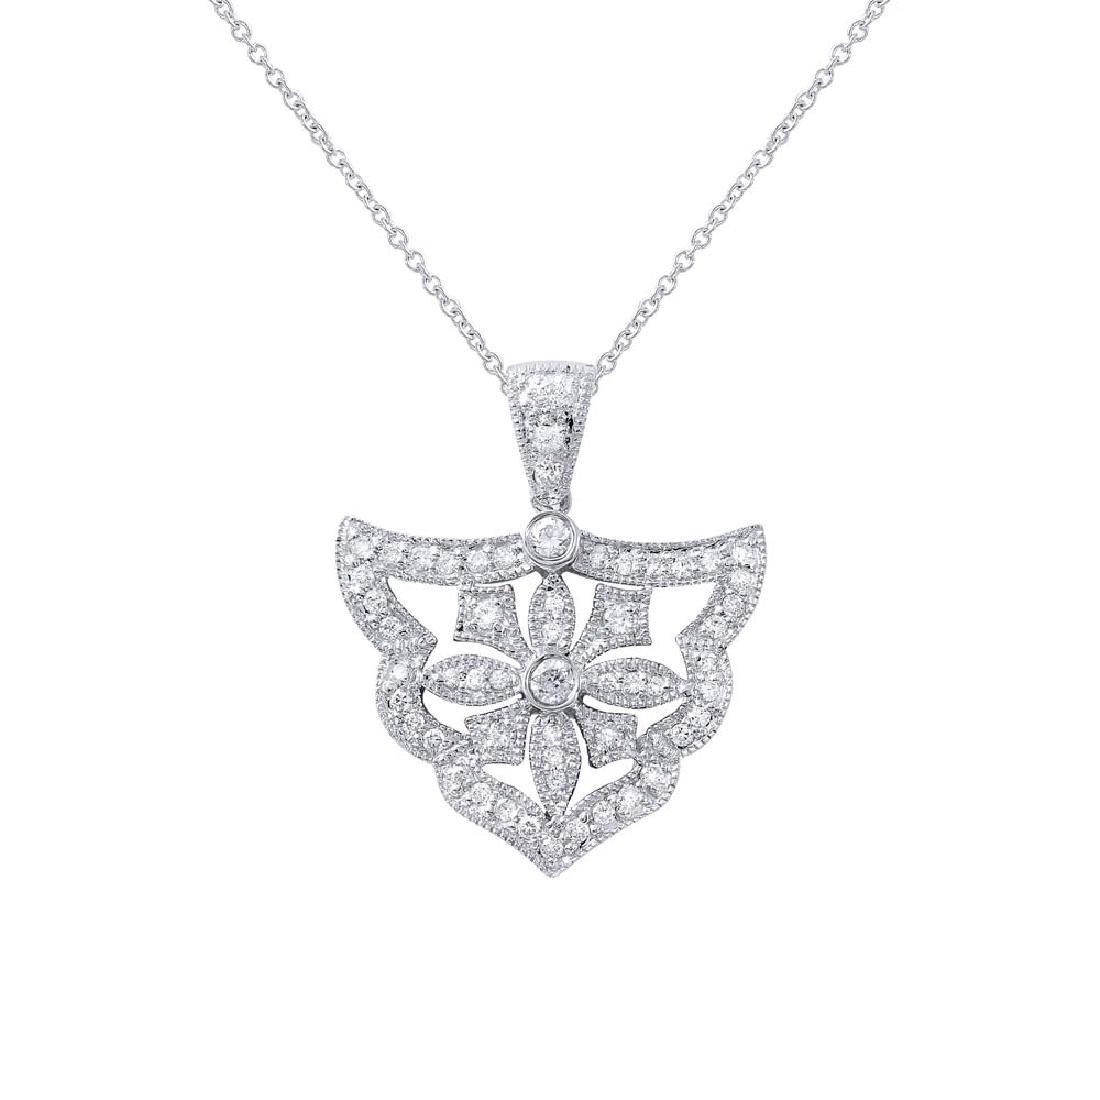 Genuine 0.49 TCW 18K White Gold Ladies Necklace